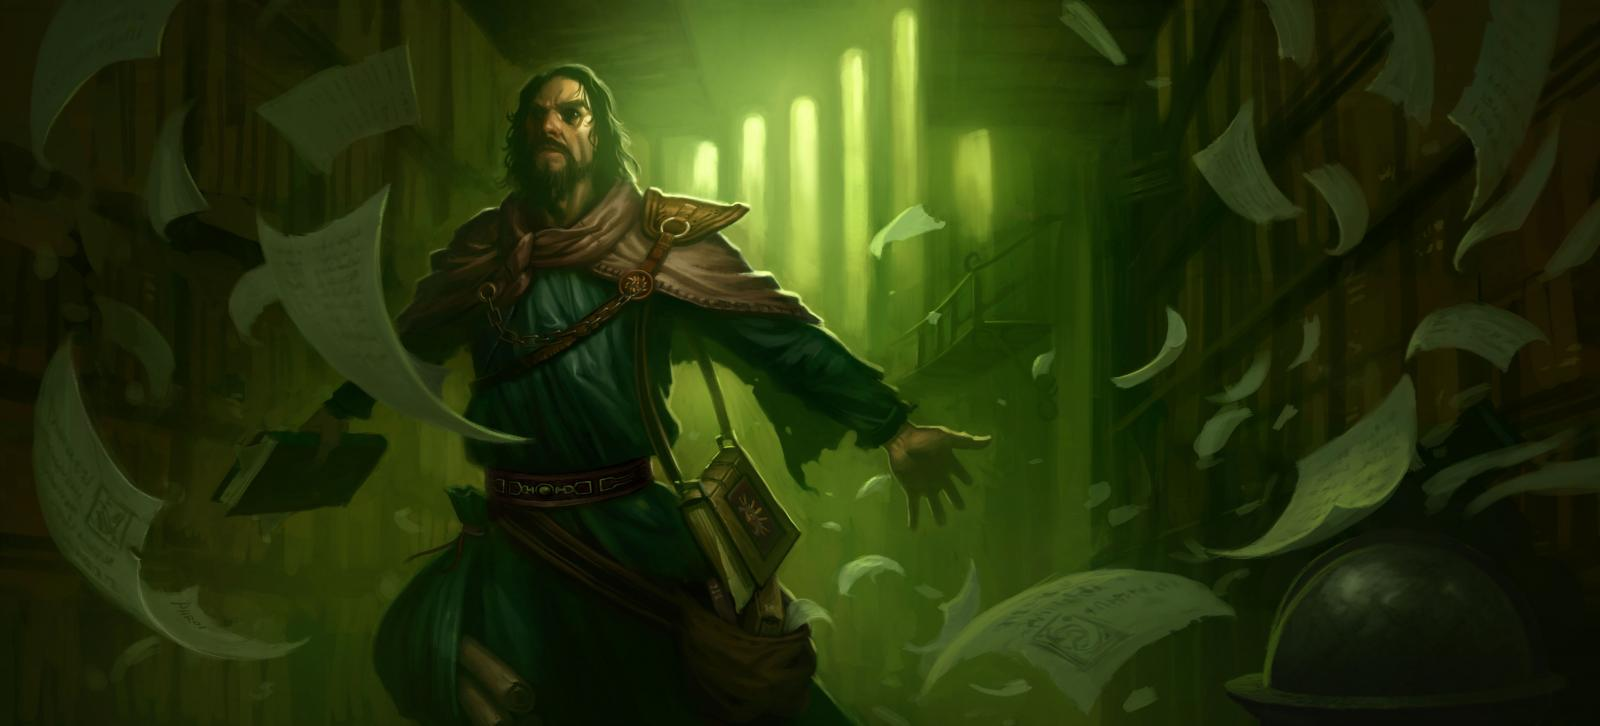 Wallpaper Diablo 3 illustration Jeux video